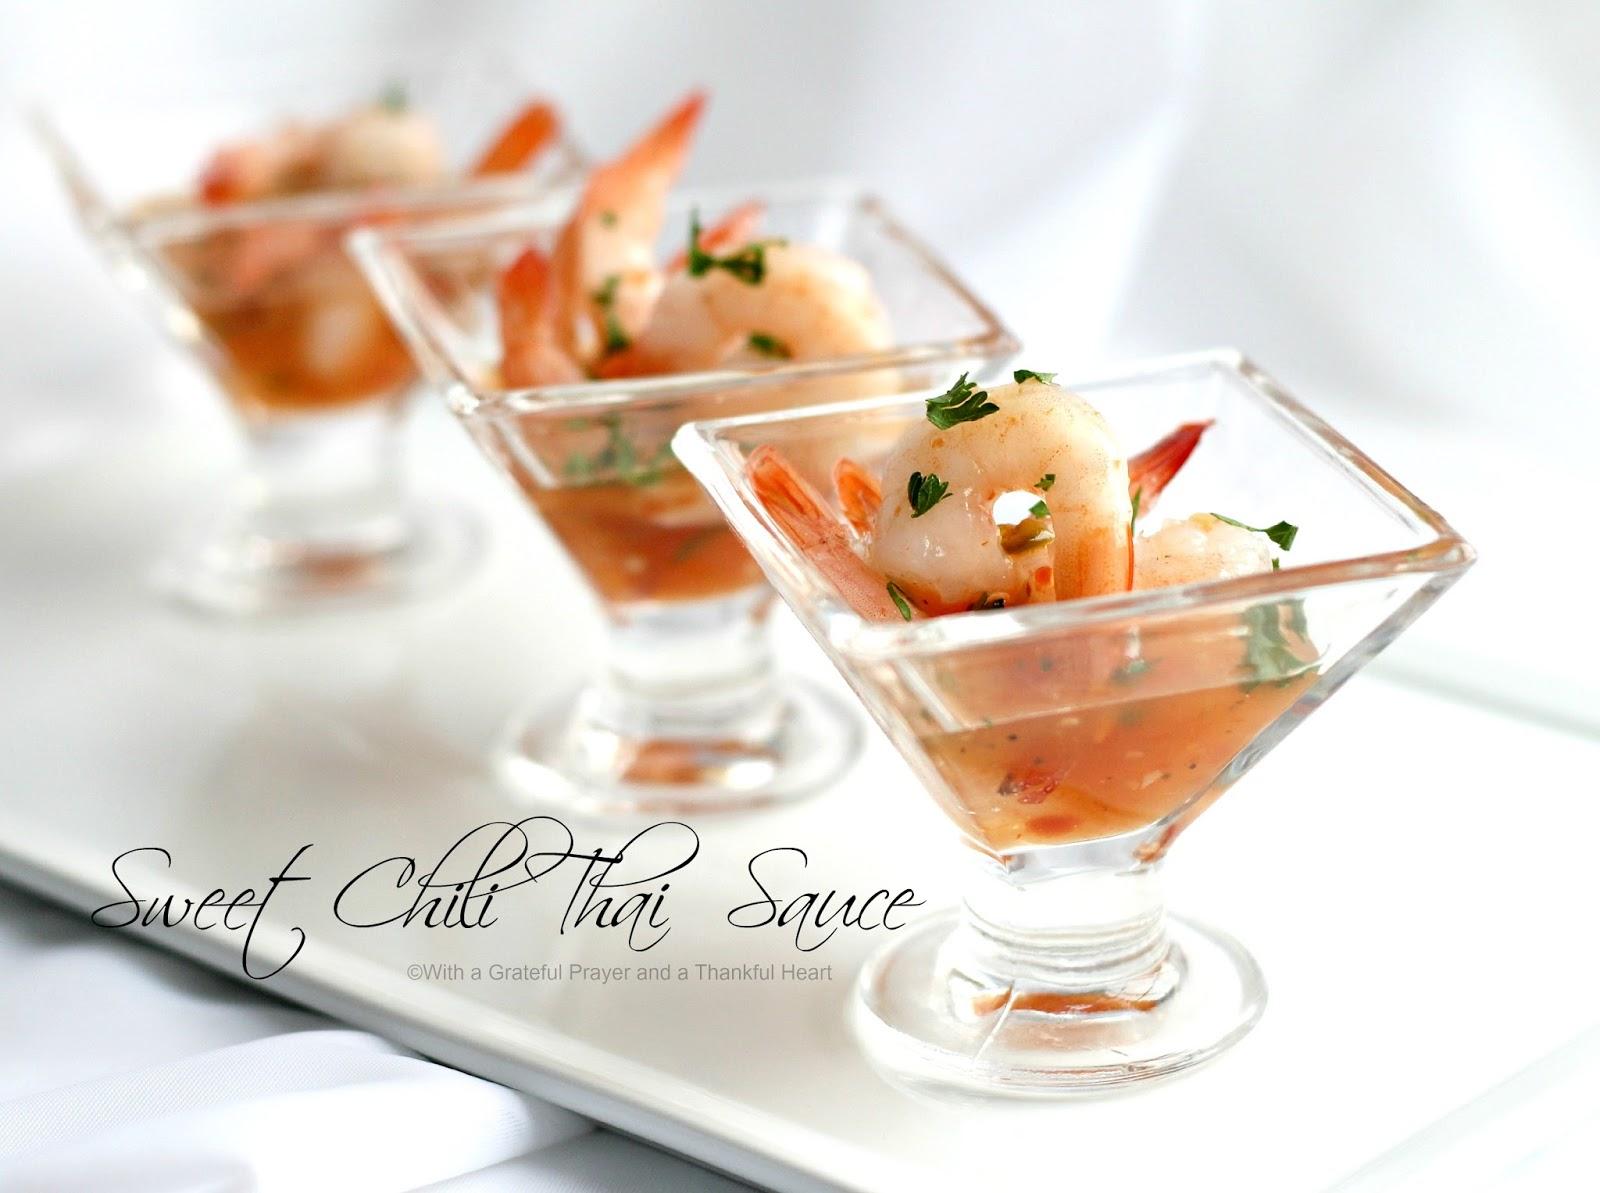 ... chili dipping sauce shrimp with sweet chili sauce firecracker shrimp